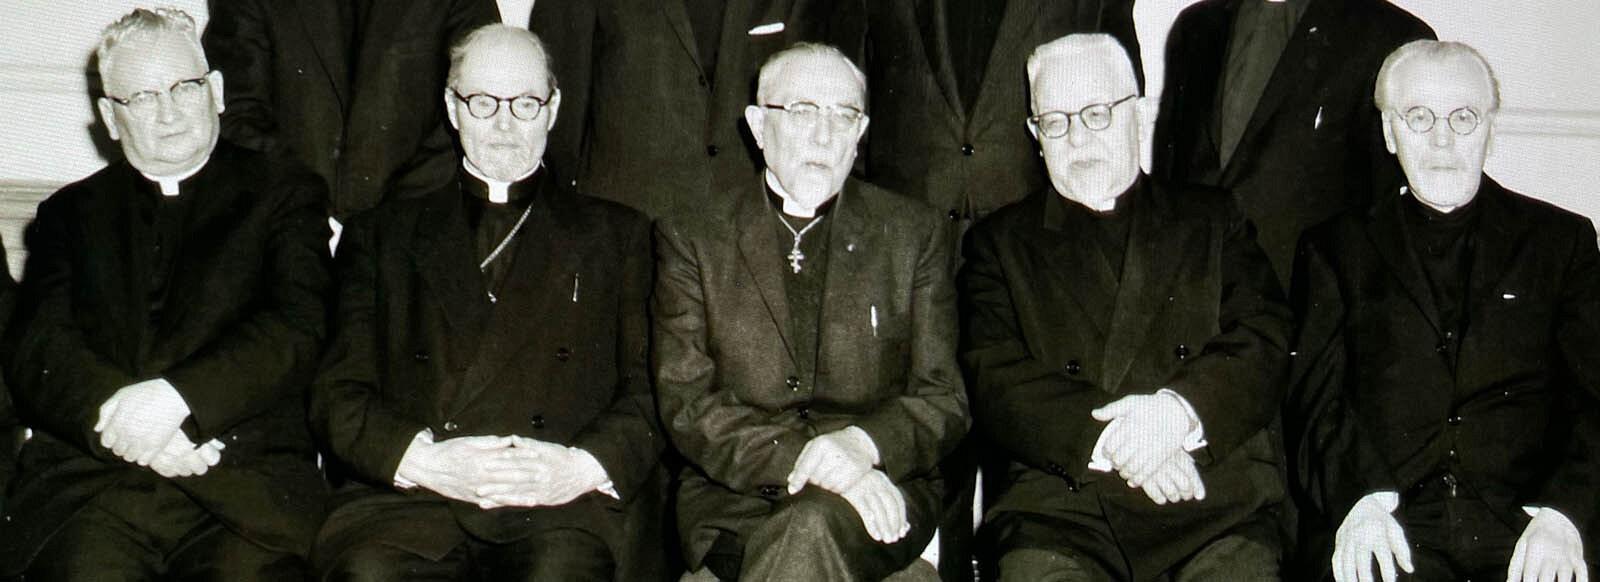 Meeting with Canadian bishops in Winnipeg, Canada 1968:Archbishop Andrew, Archbishop Michael, Metropolitan John, Metropolitan Ilarion and Archbishop Volodymyr